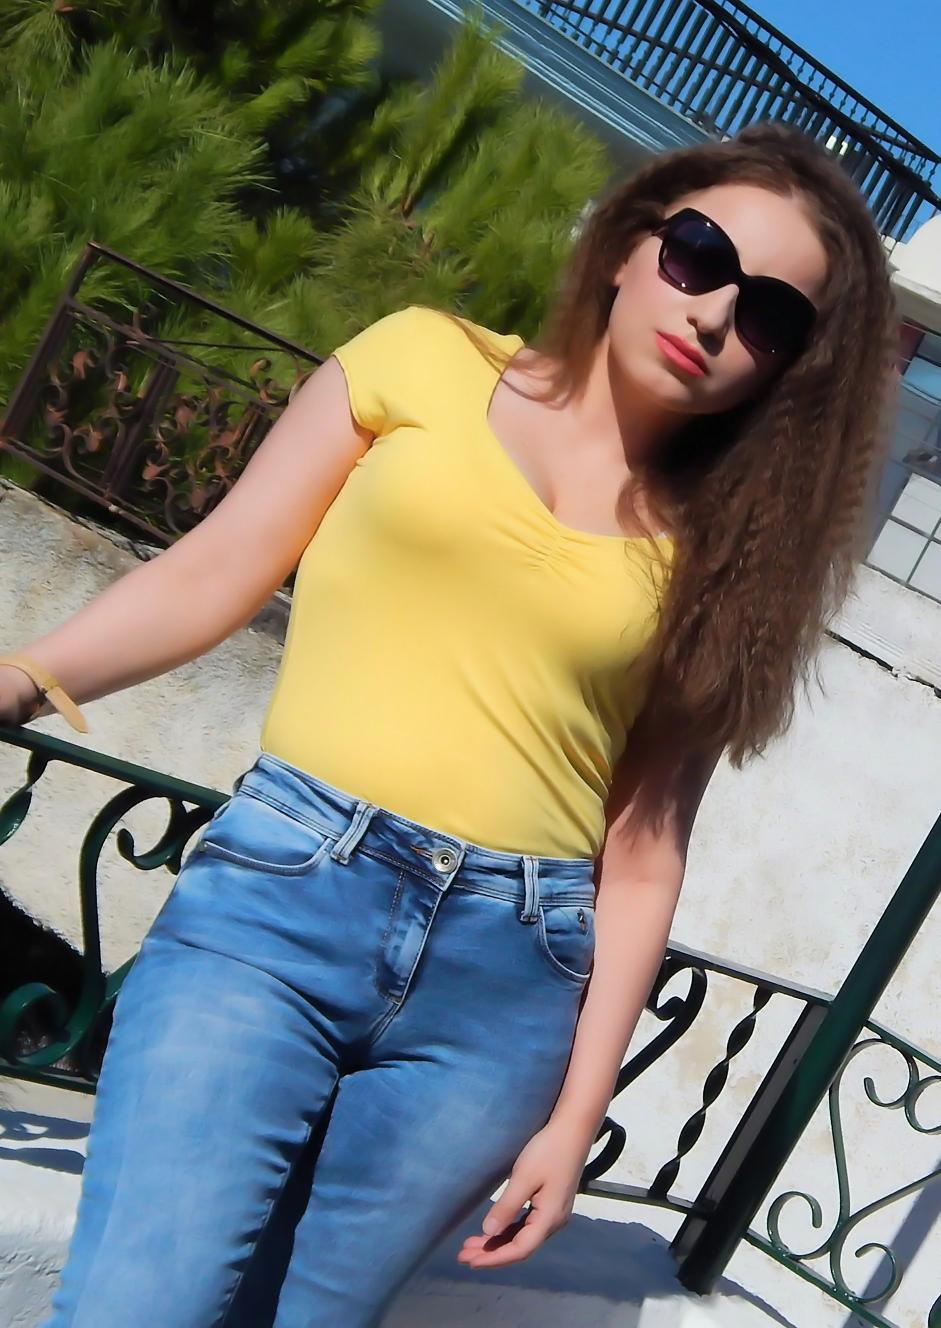 lorena-stroka-biografia-foto-wikipedia-age-blog-gazetare-kontakt-instagram-style-age-2019-albstroka-shkrimtare-facebook